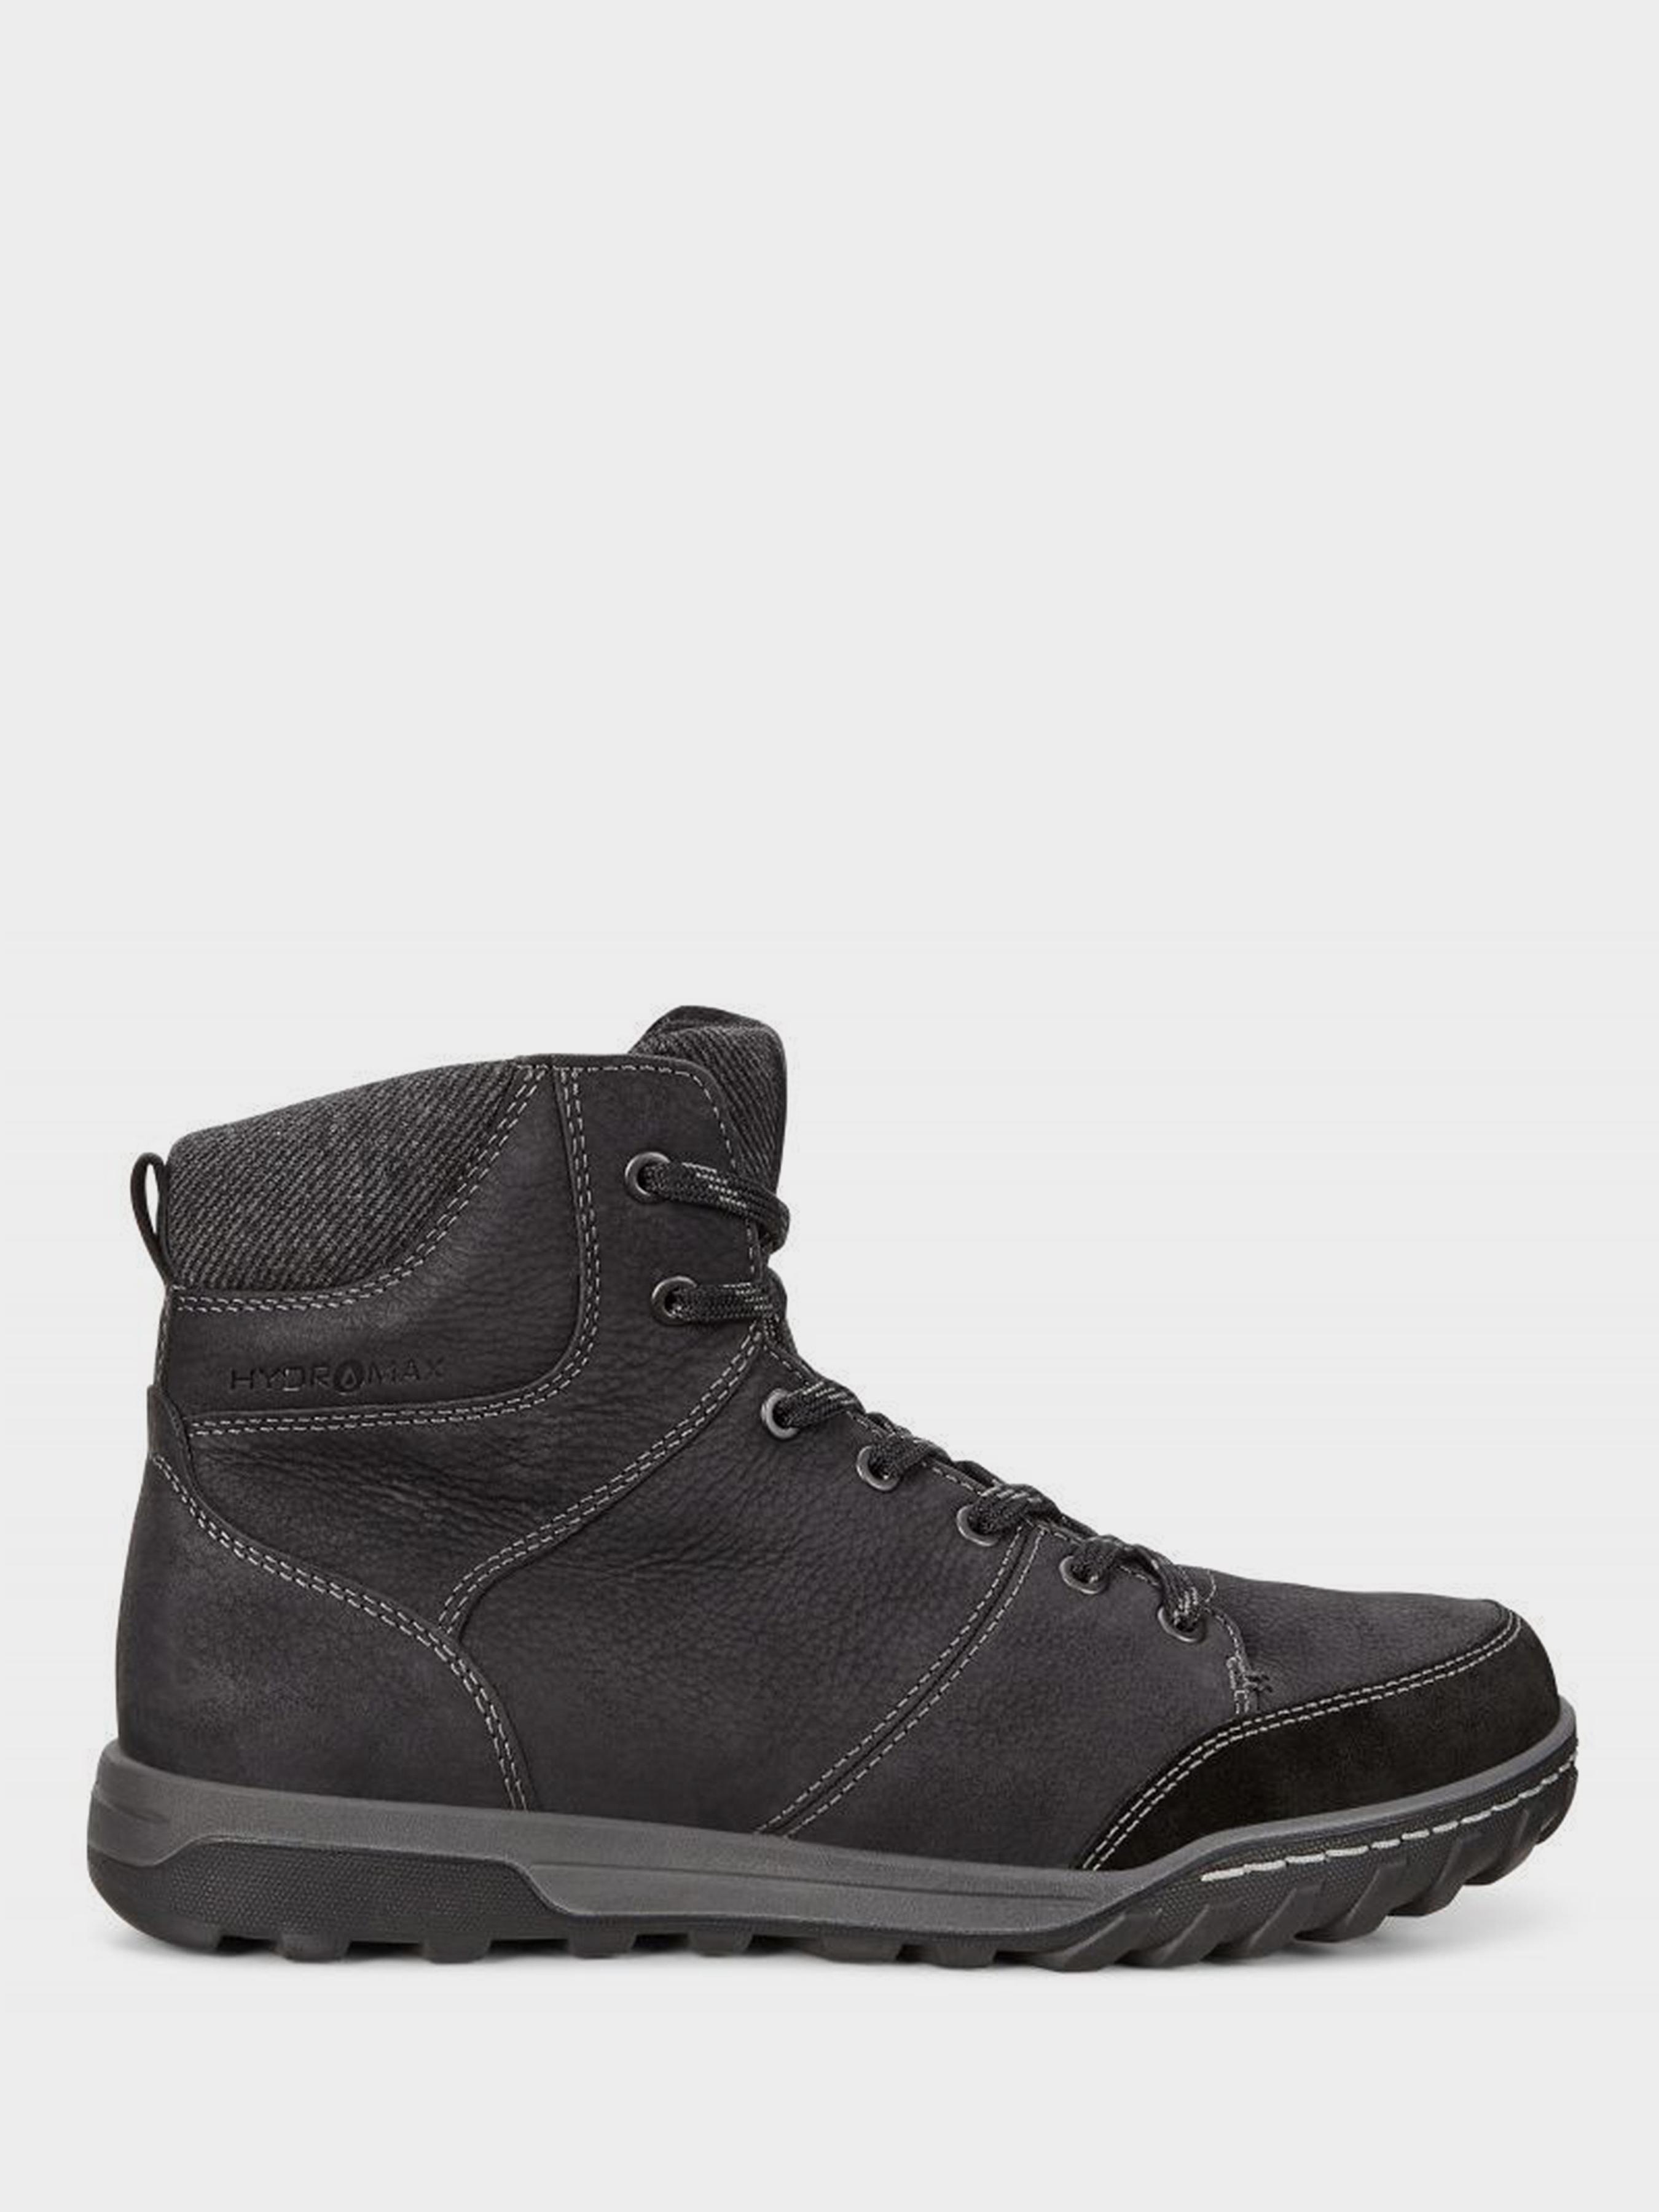 ECCO URBAN LIFESTYLE Чорний. ECCO URBAN LIFESTYLE Коричневий. Чоловічі  черевики e18bff25037f2